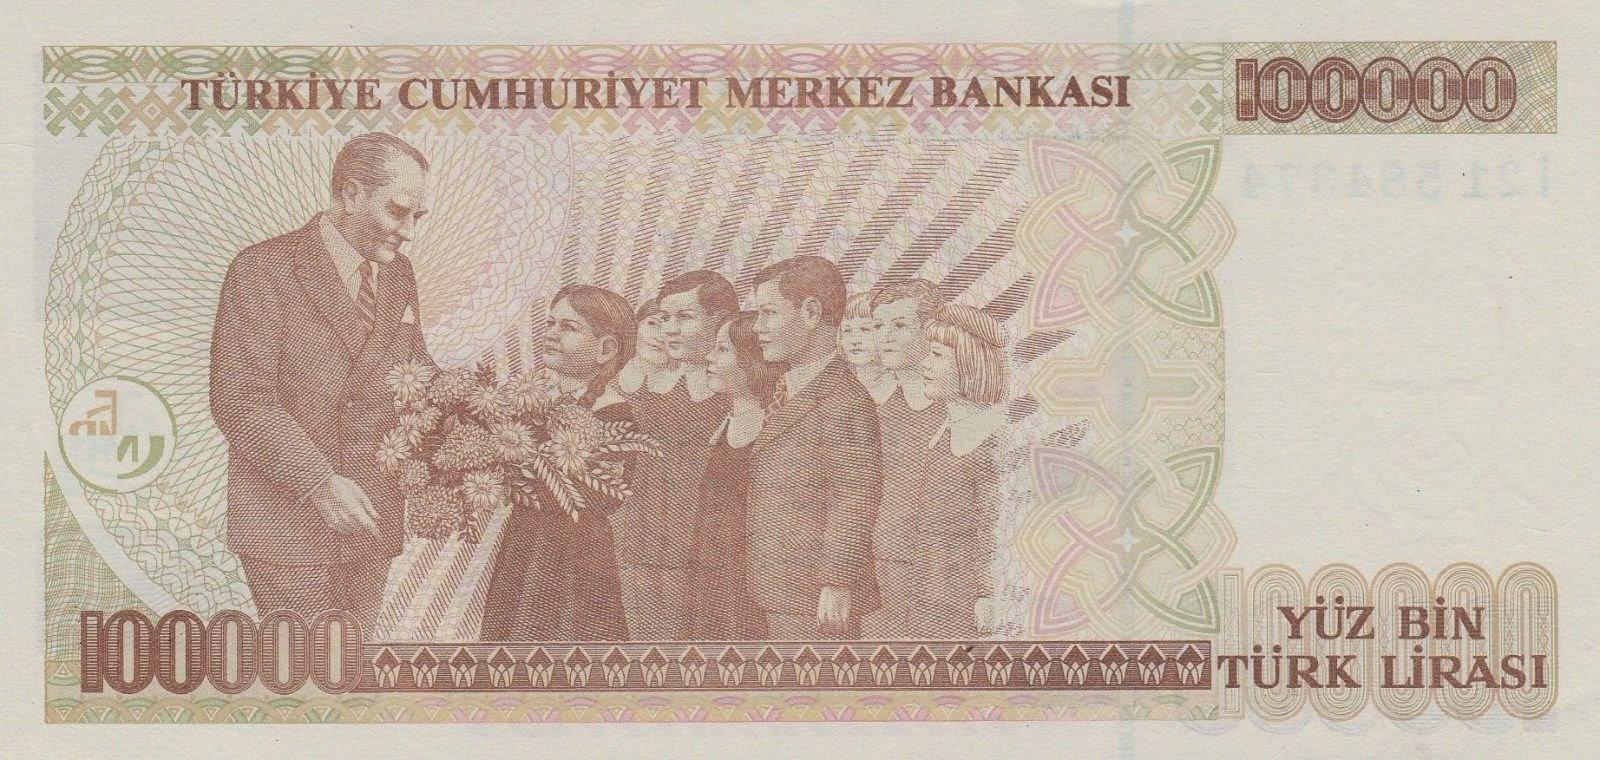 100000 Turkish Lira, Children presenting flowers to Atatürk